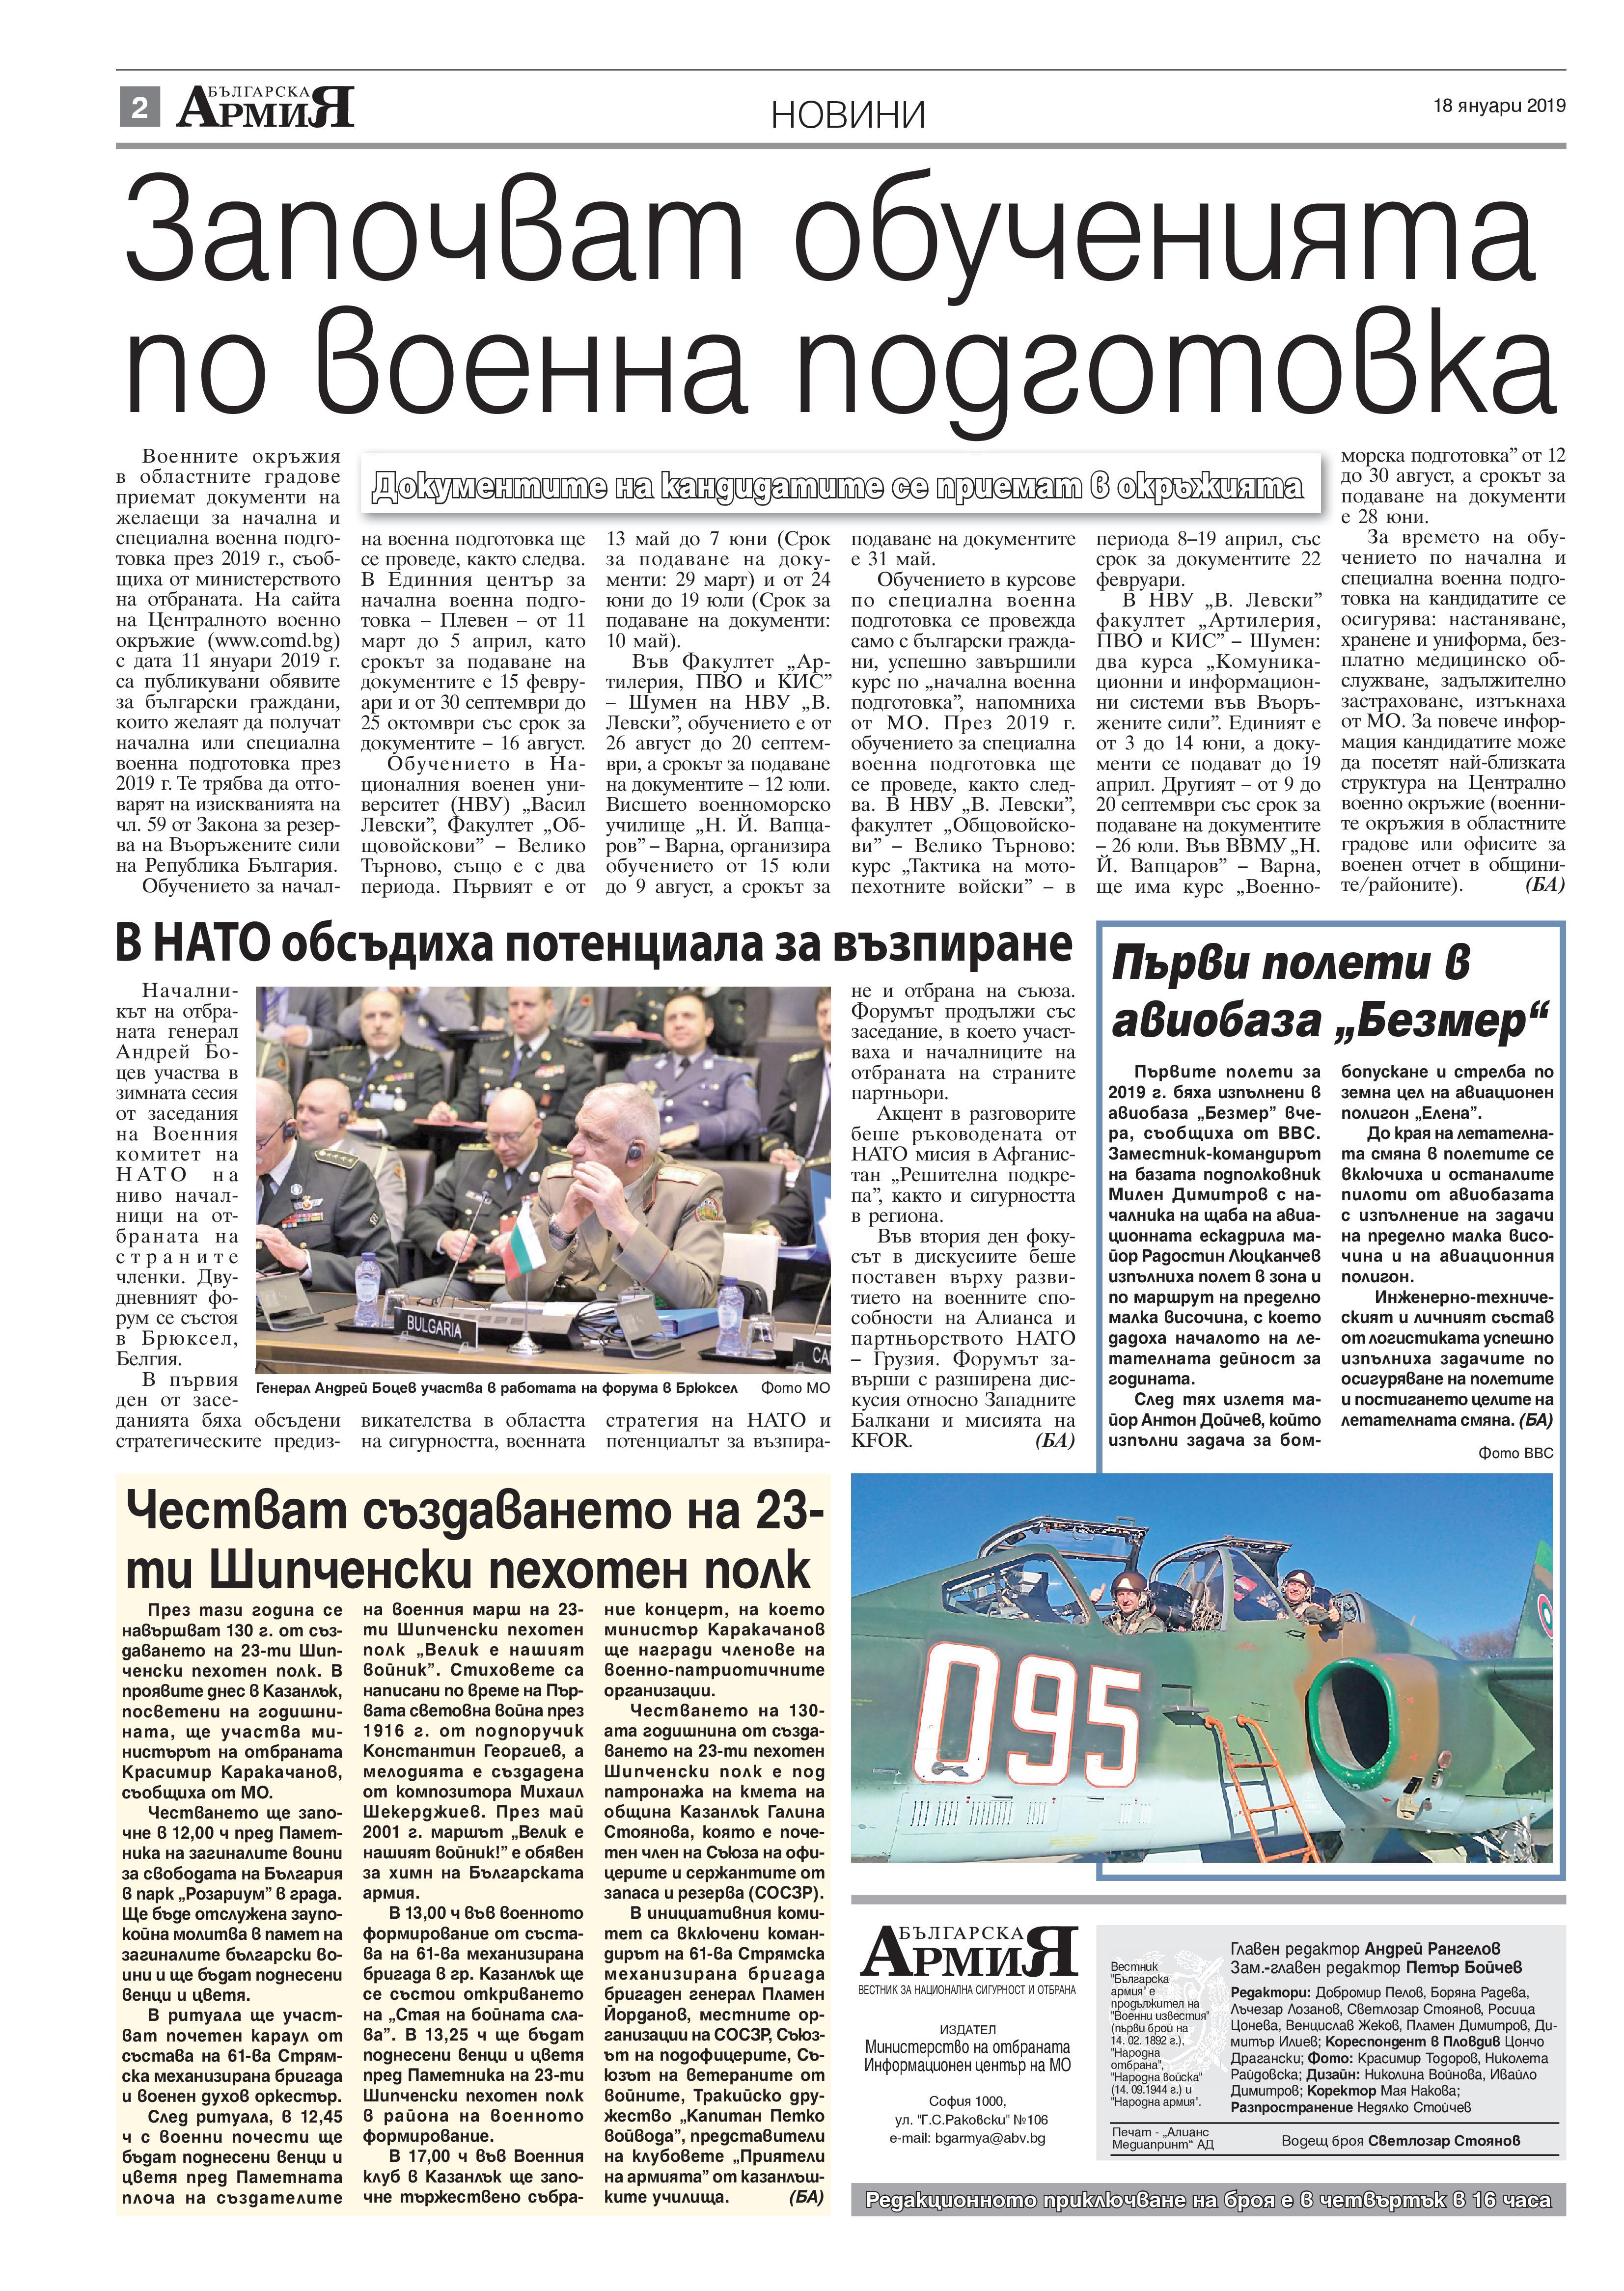 https://armymedia.bg/wp-content/uploads/2015/06/02-25.jpg